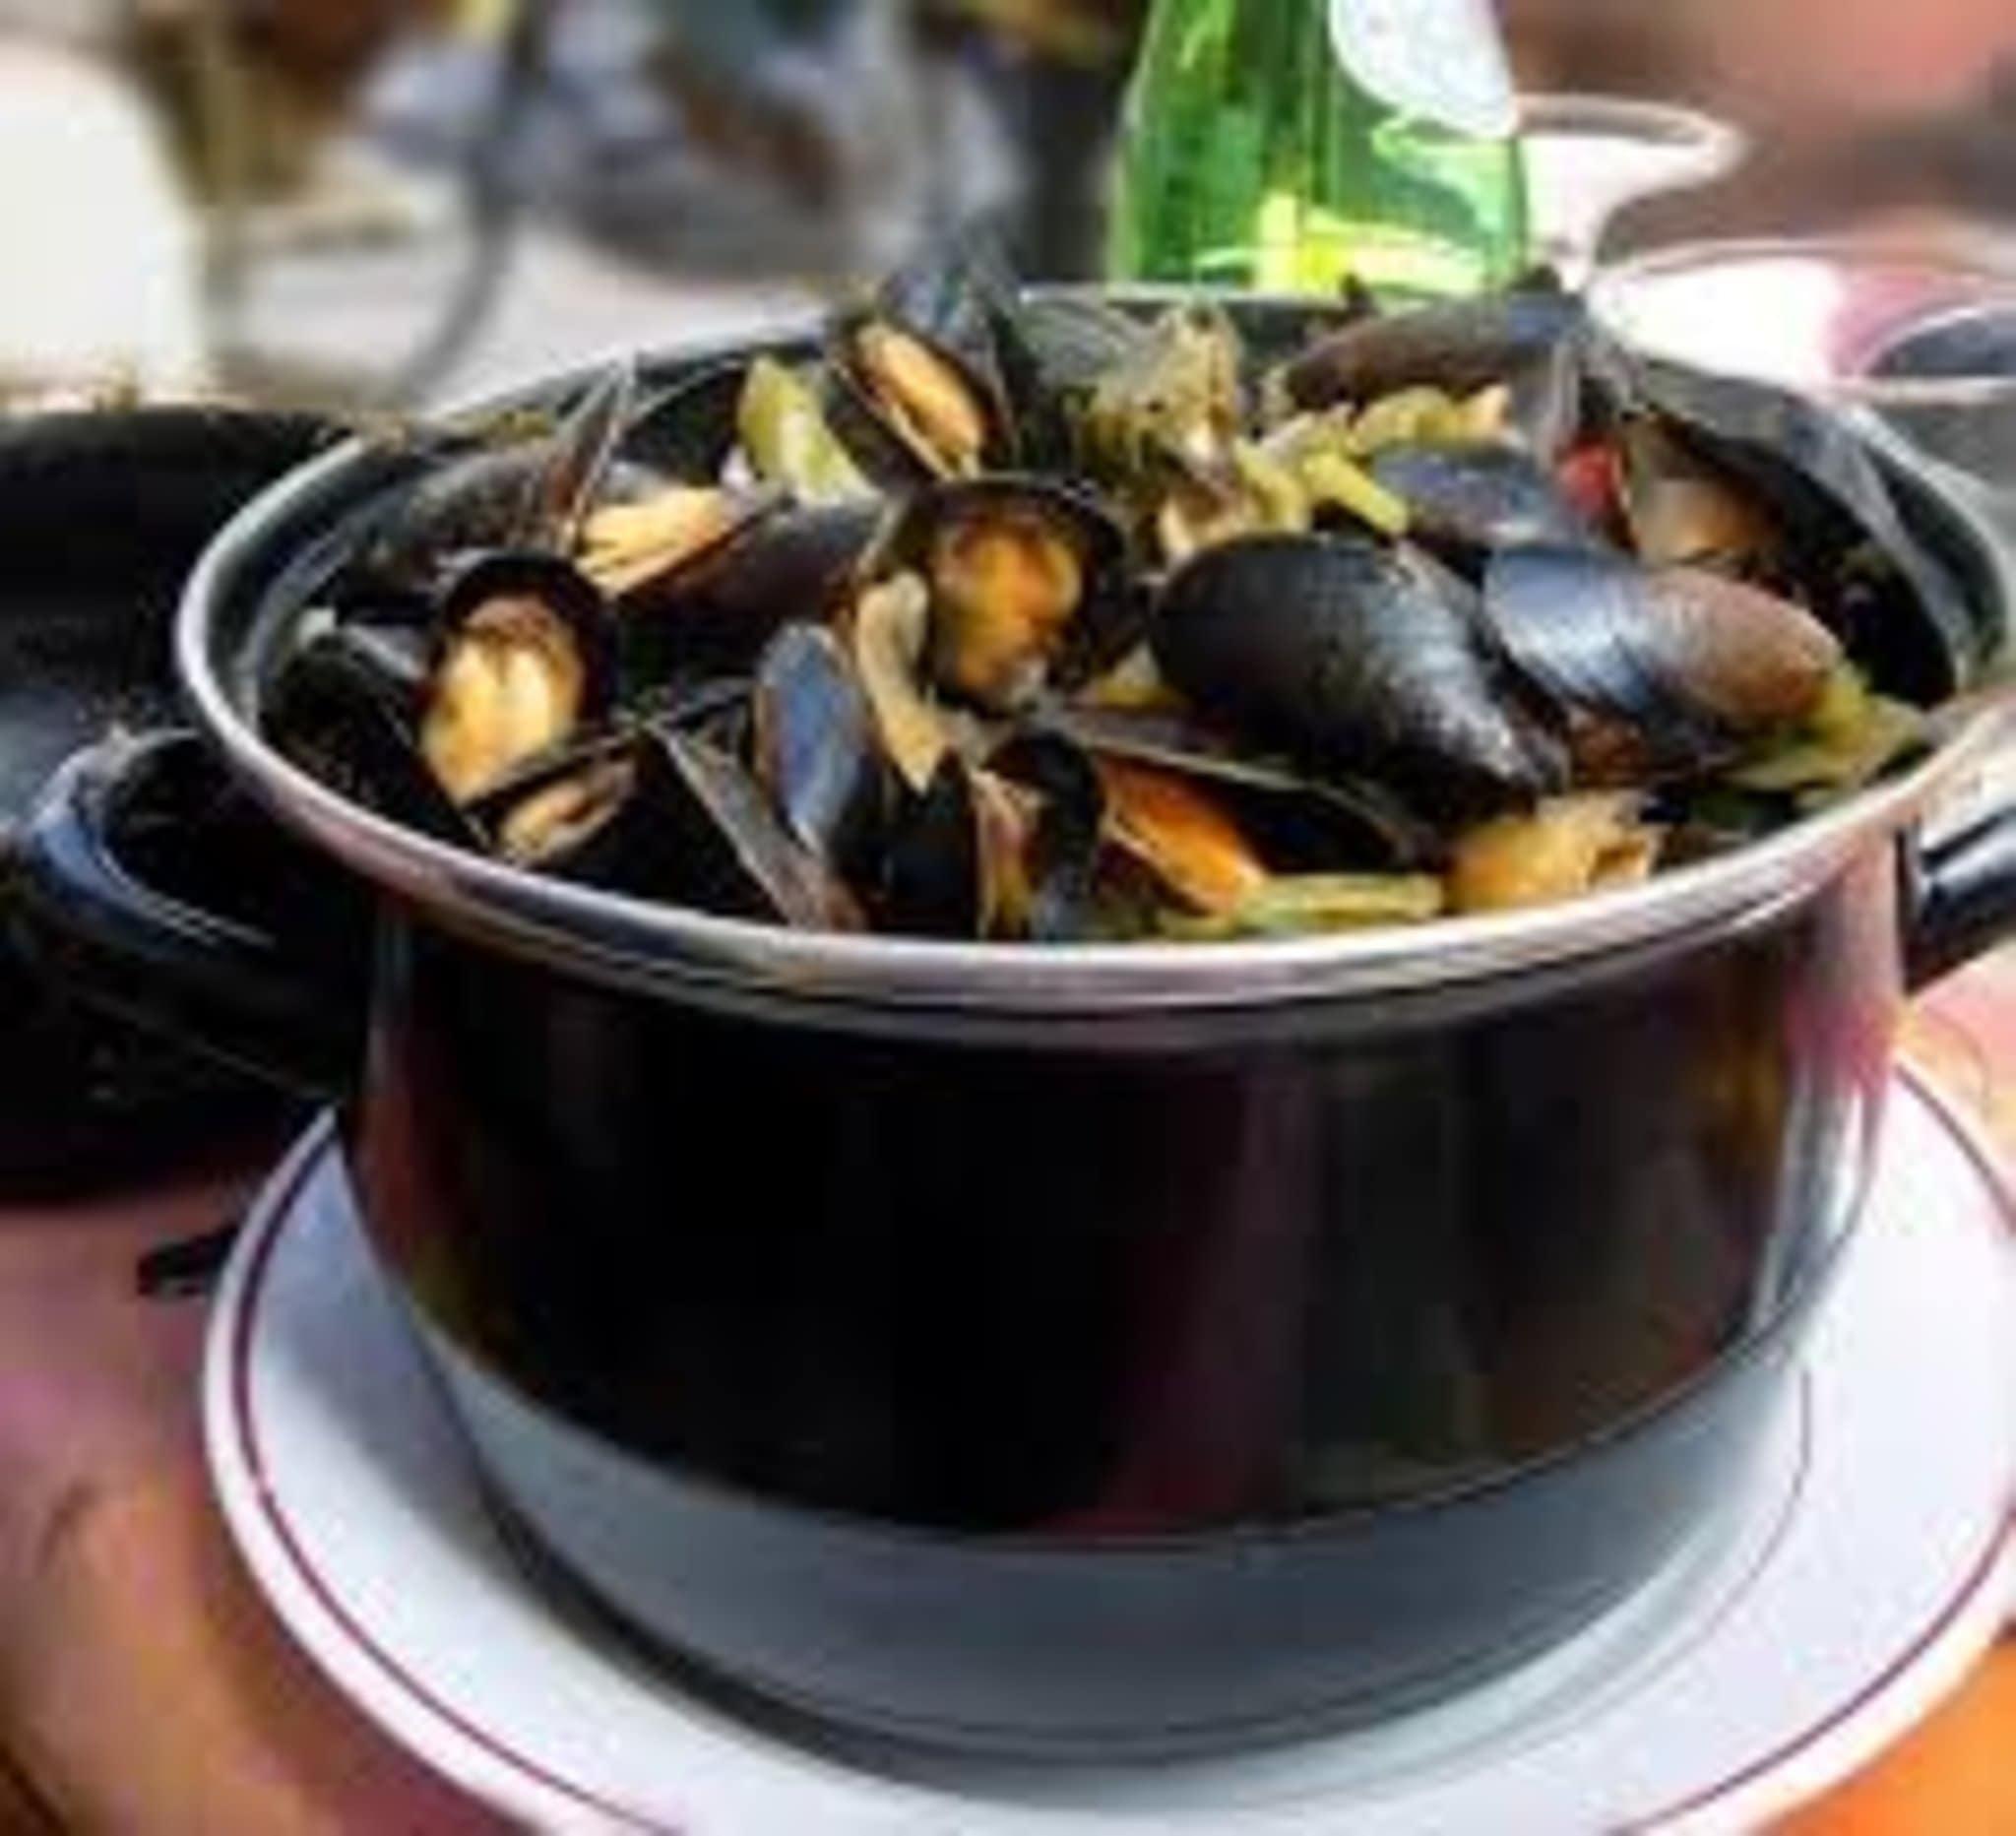 Brancaster Mussels